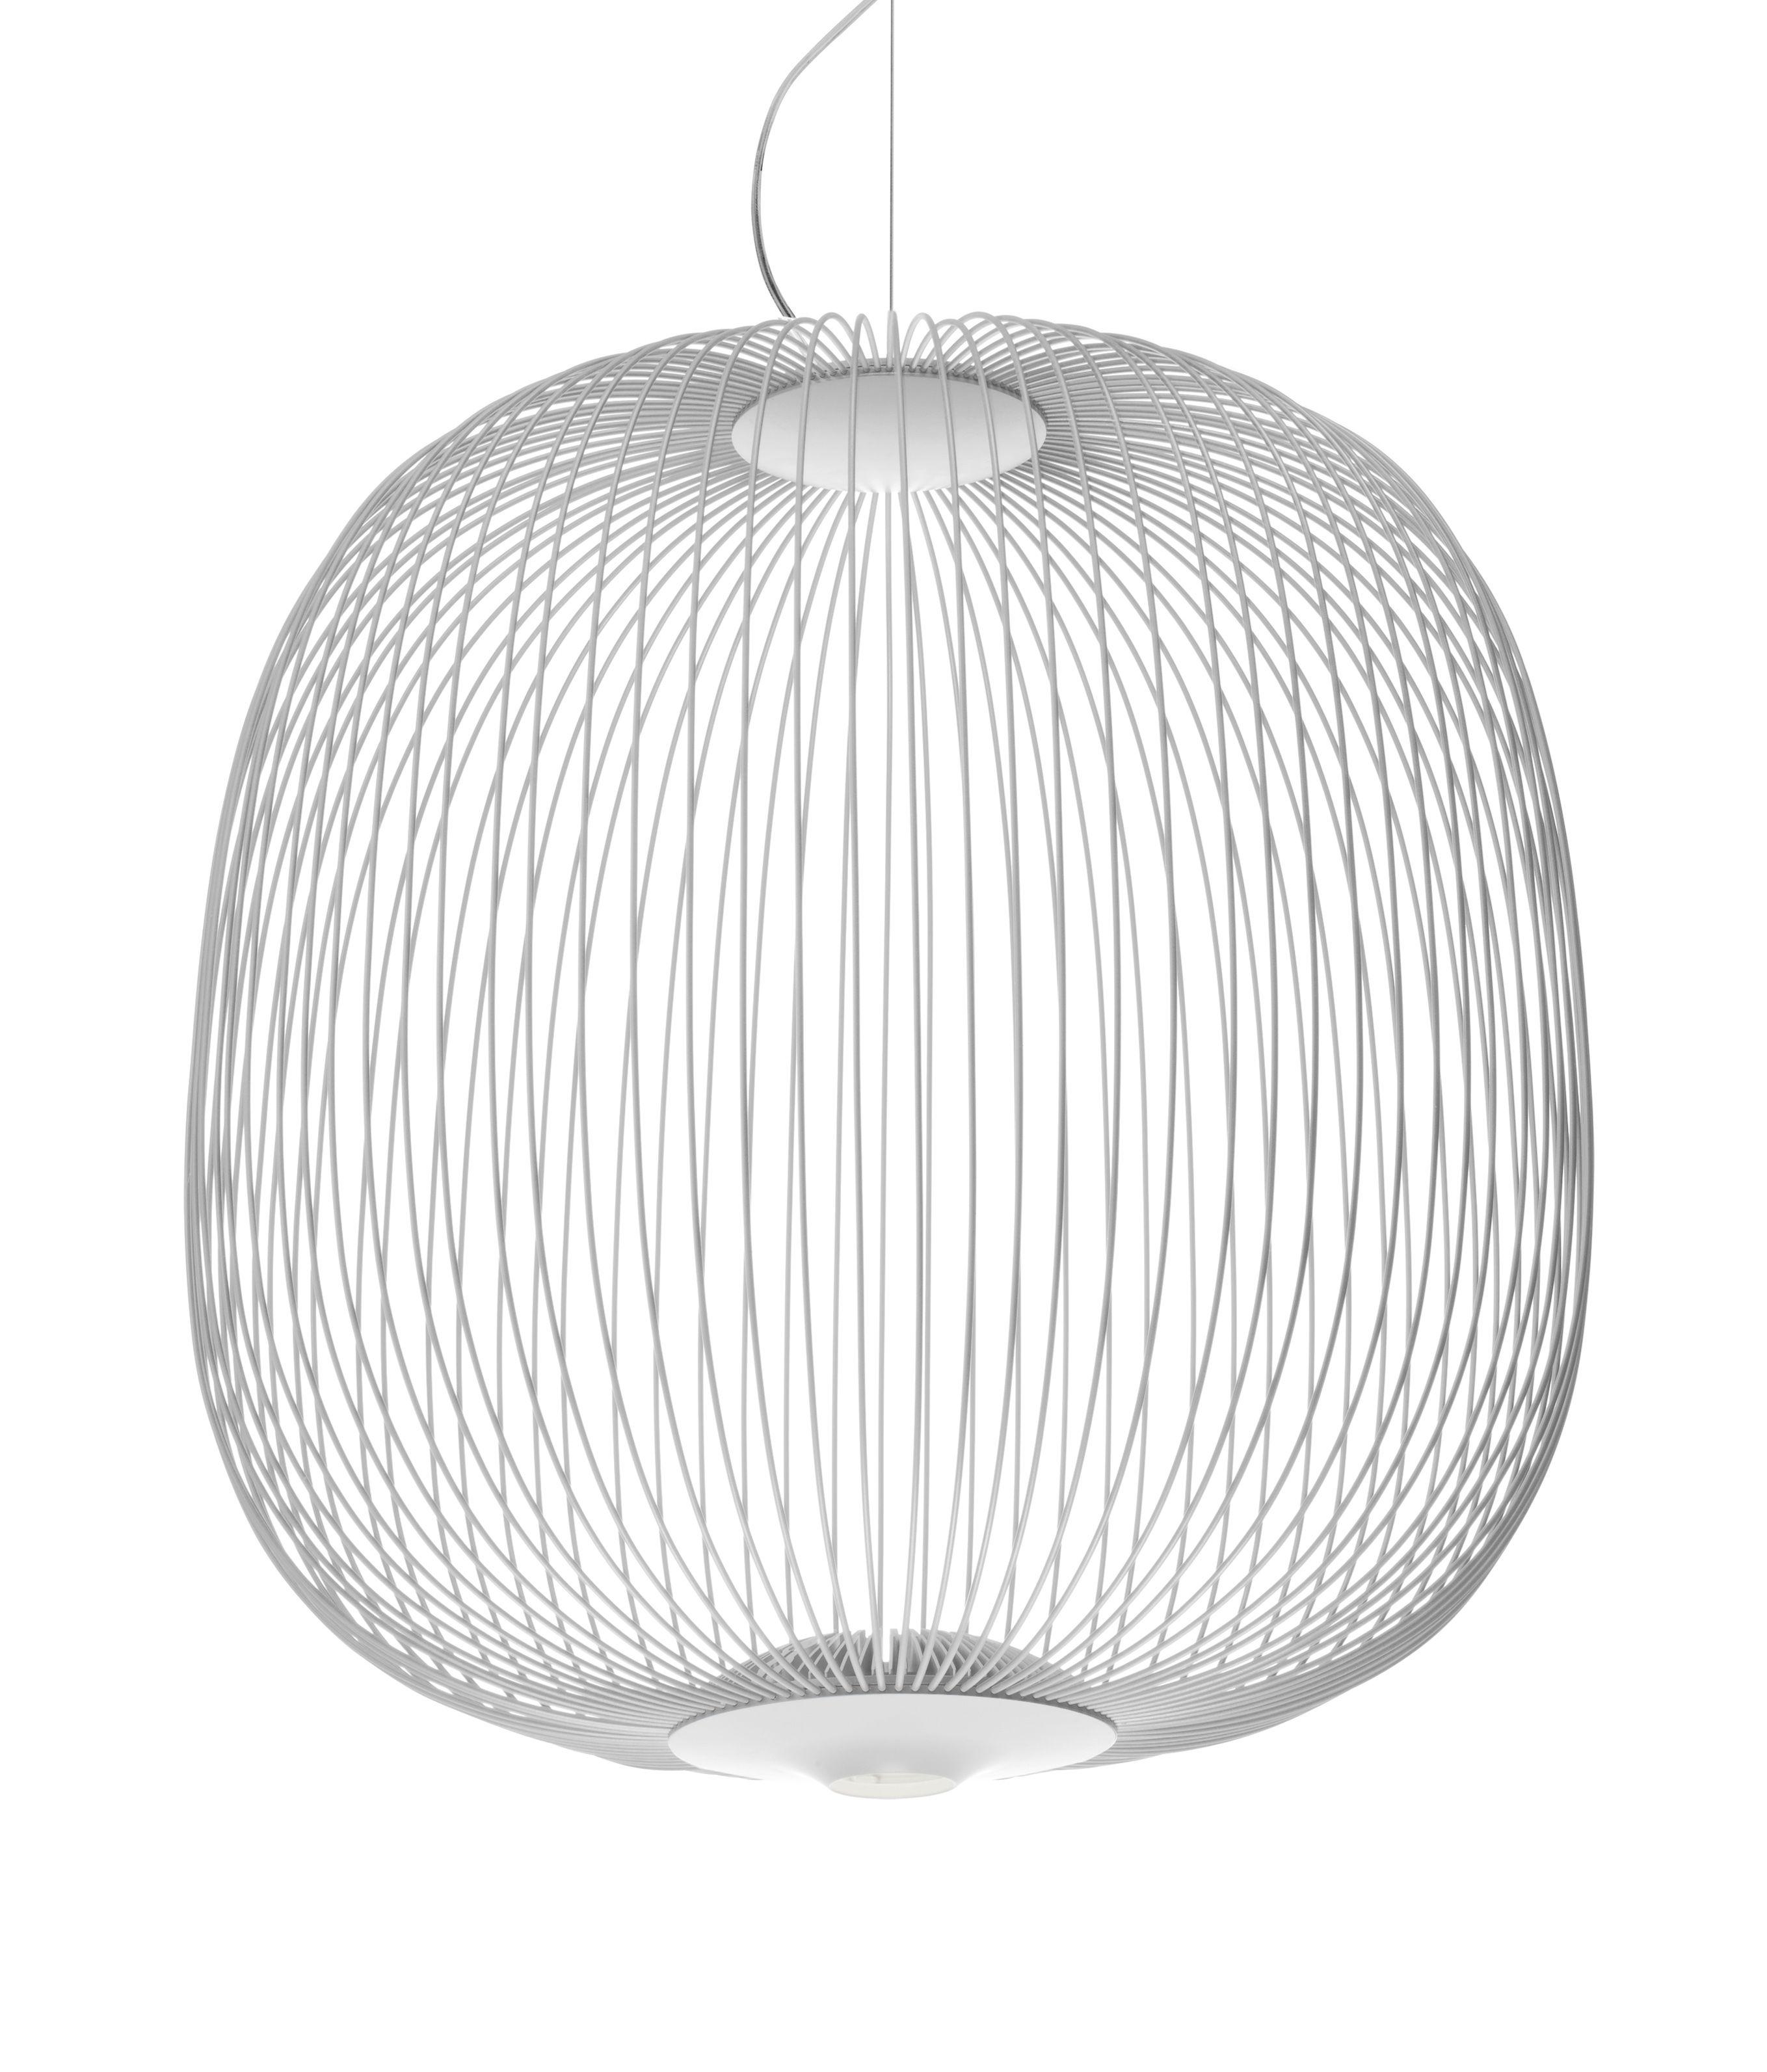 suspension spokes 2 small led 52 x h 52 cm blanc foscarini. Black Bedroom Furniture Sets. Home Design Ideas